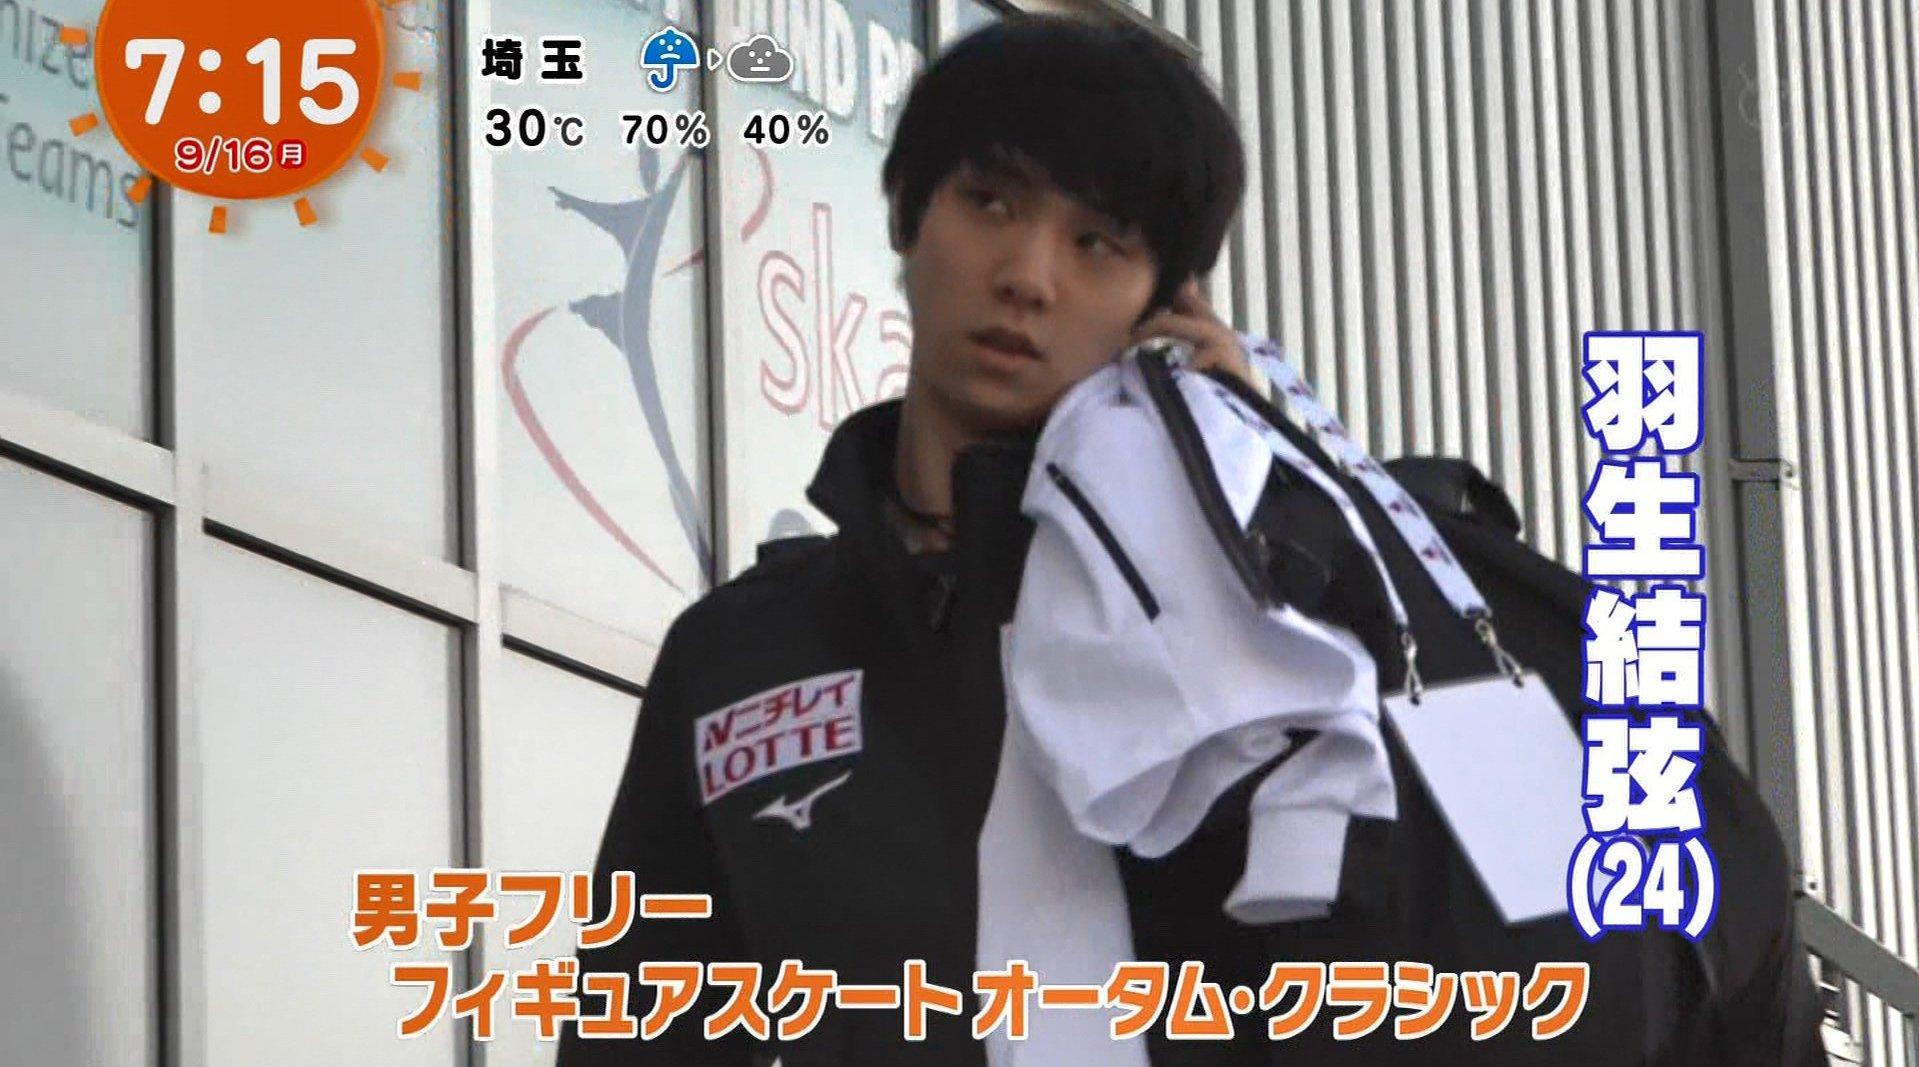 20190916mezamashi tv 羽生结弦